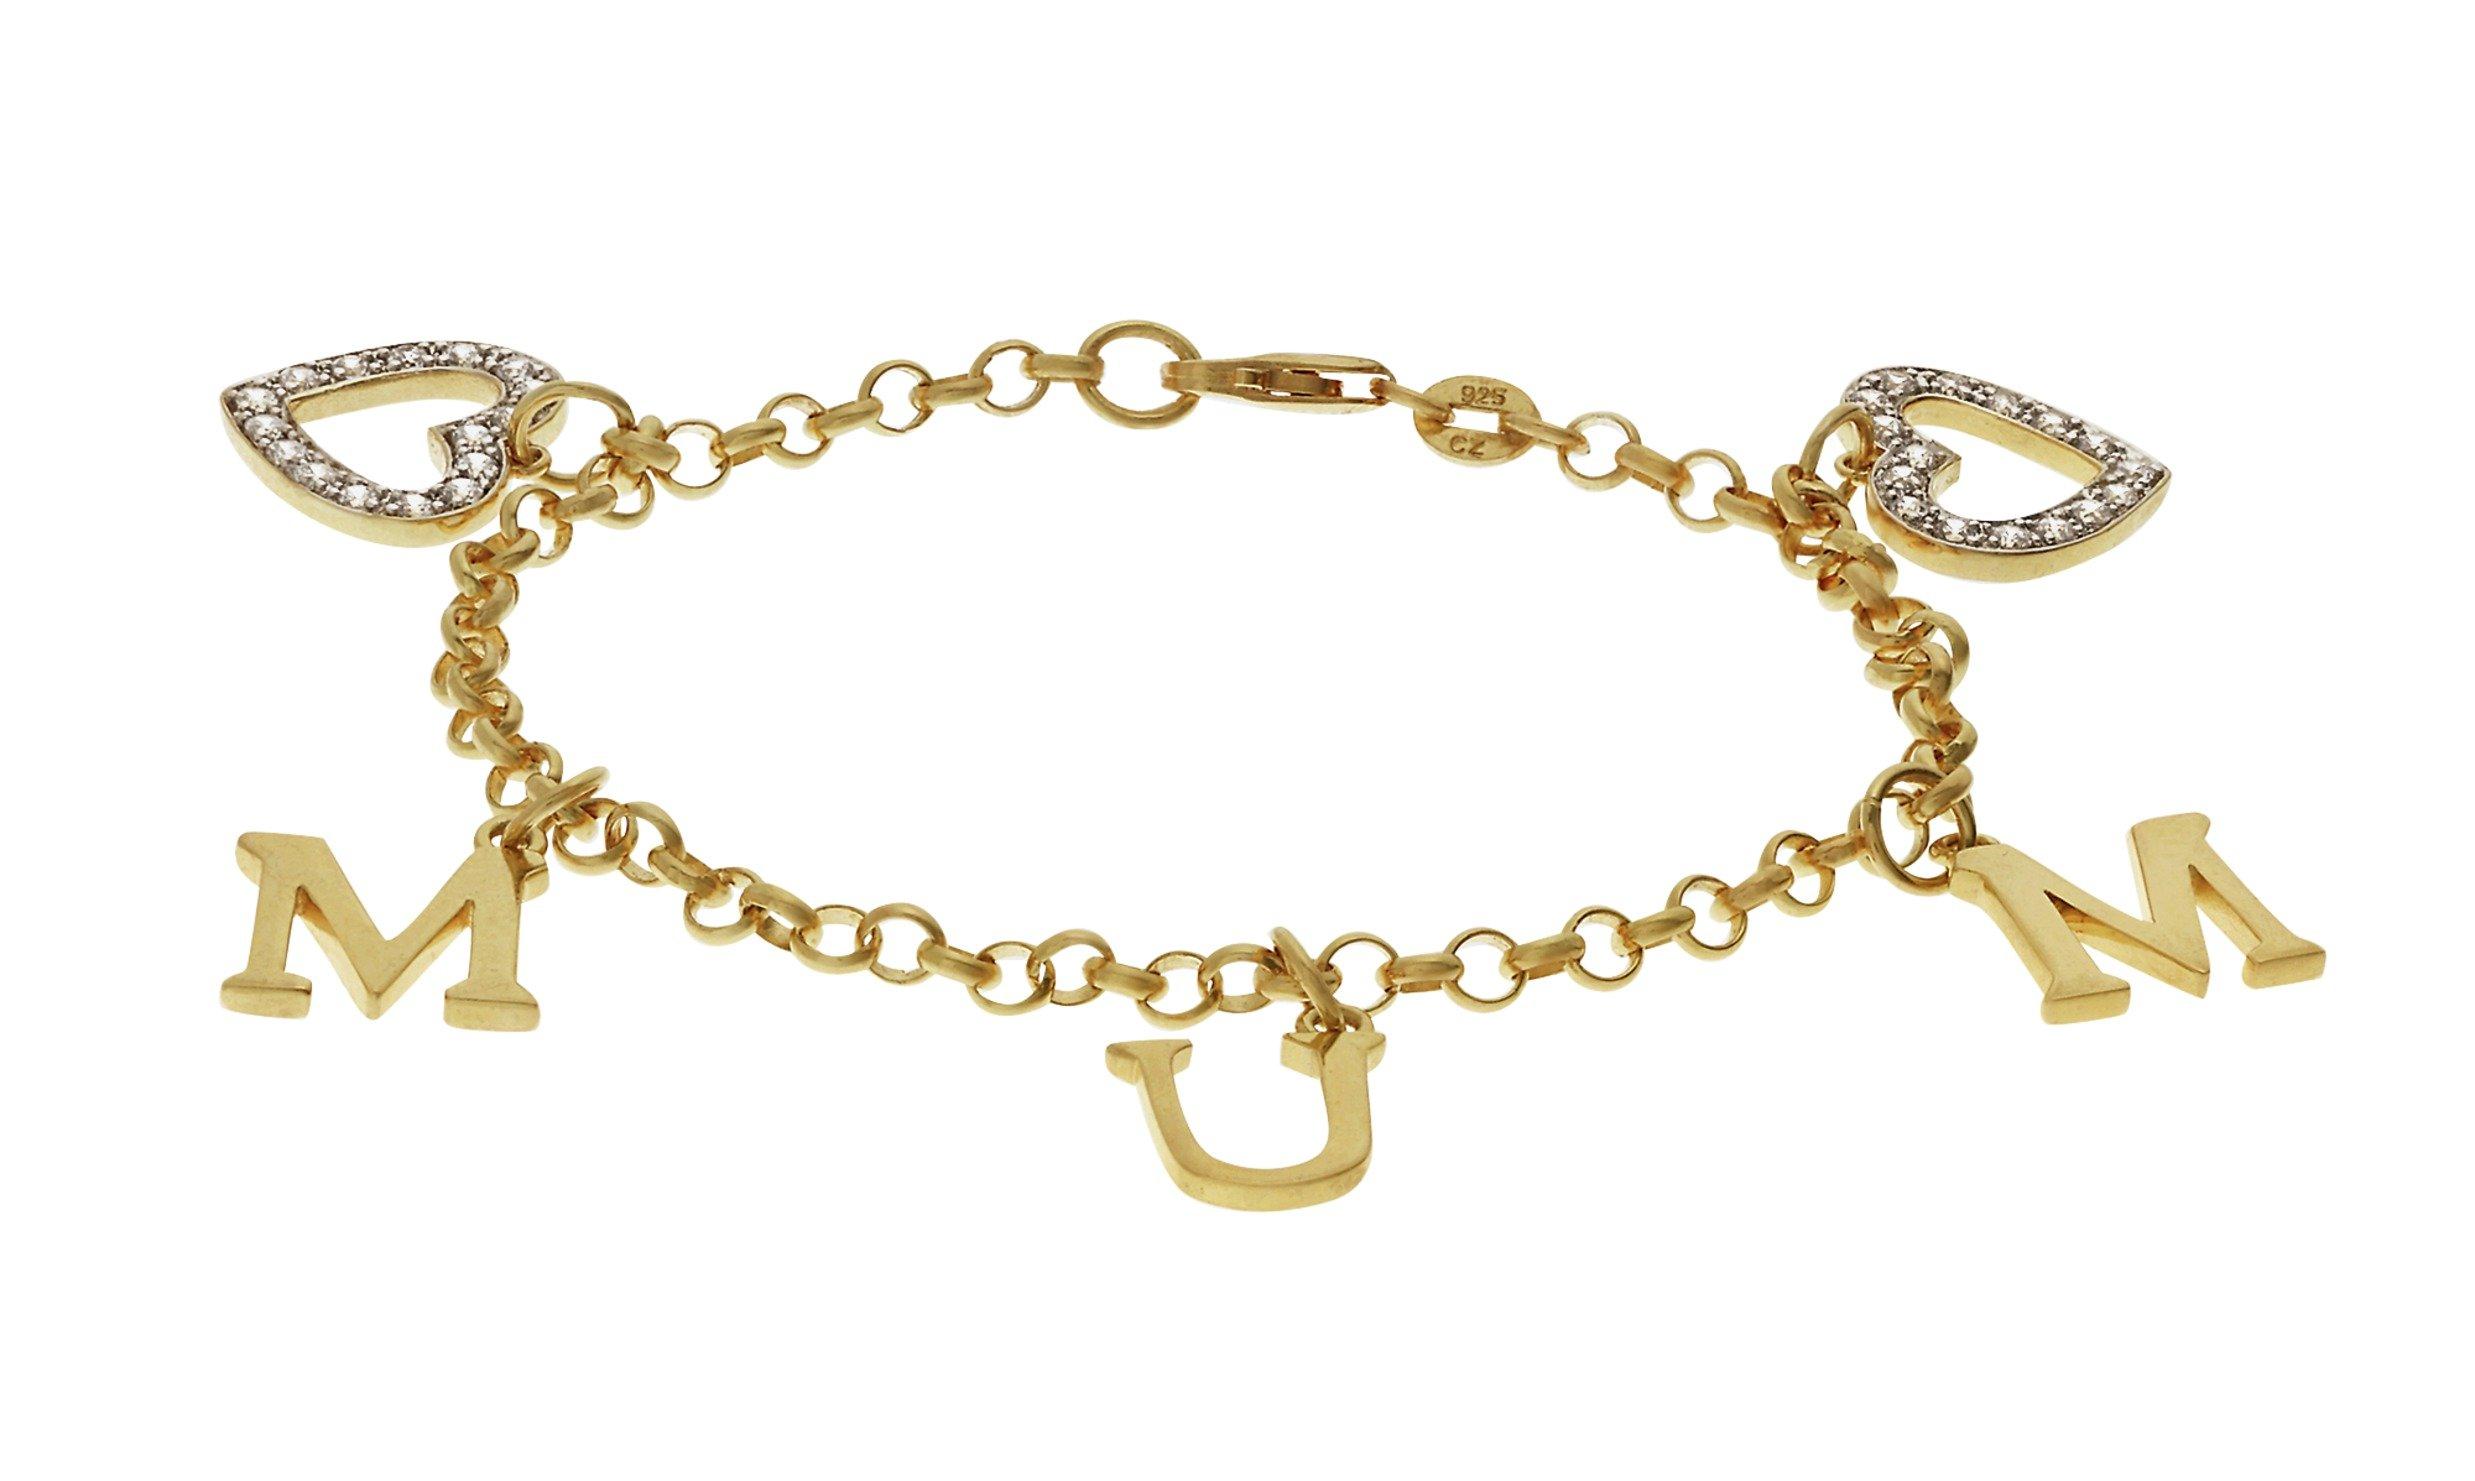 18 Carat Gold - Plated - Silver CZ 'Mum' Heart Charm Bracelet.